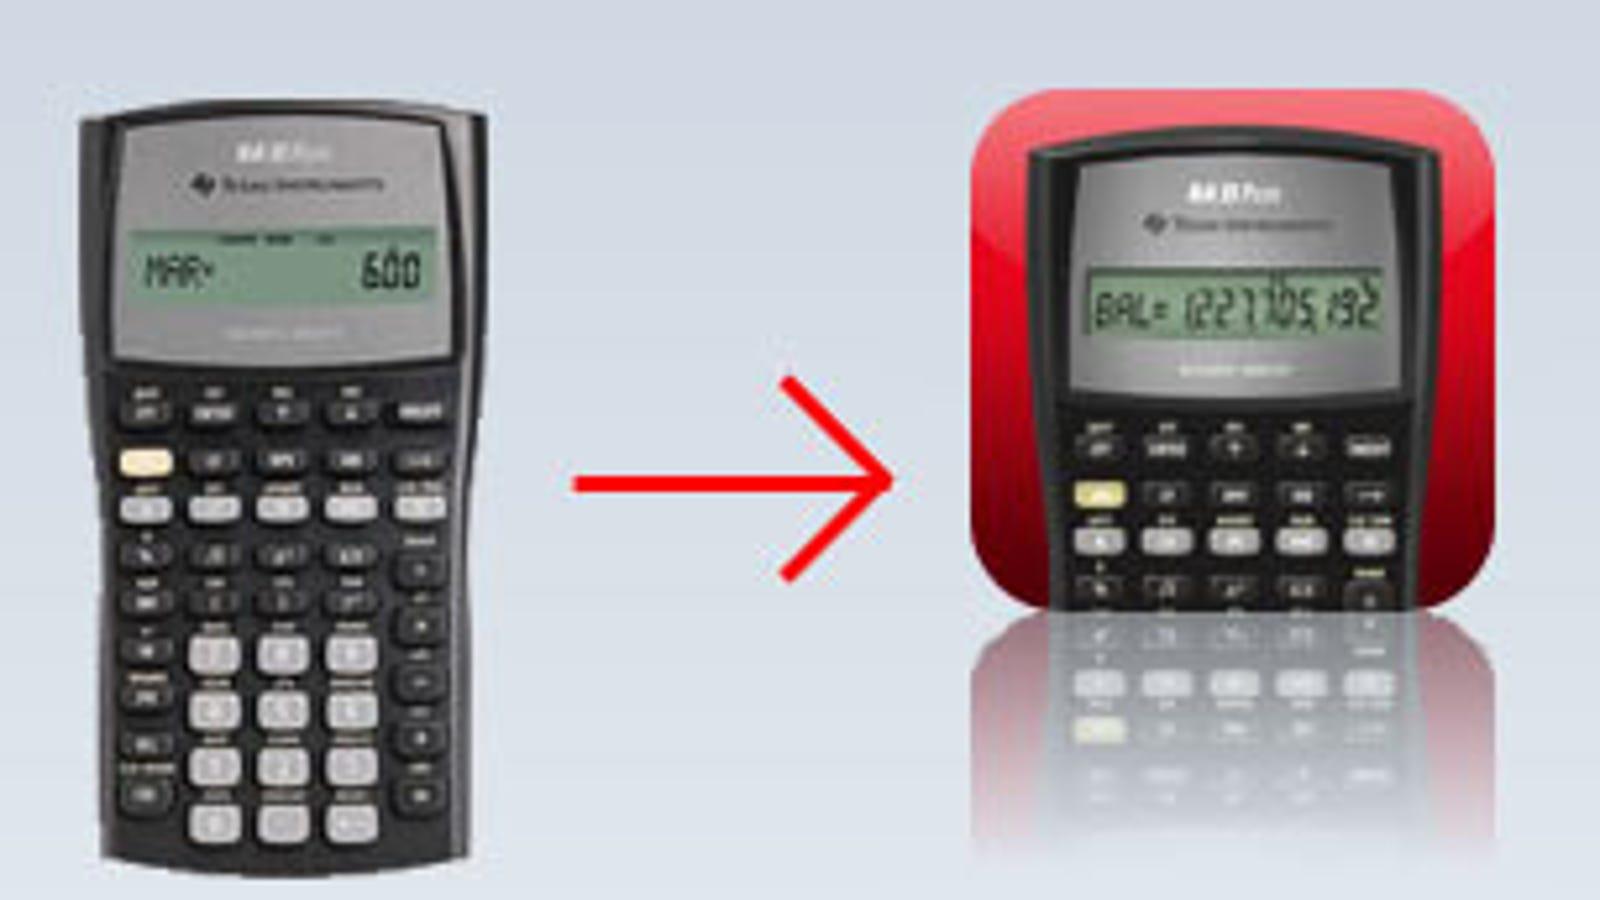 TI Turns $30 Calculator Into $15 iPhone App, Swears People Still Pay